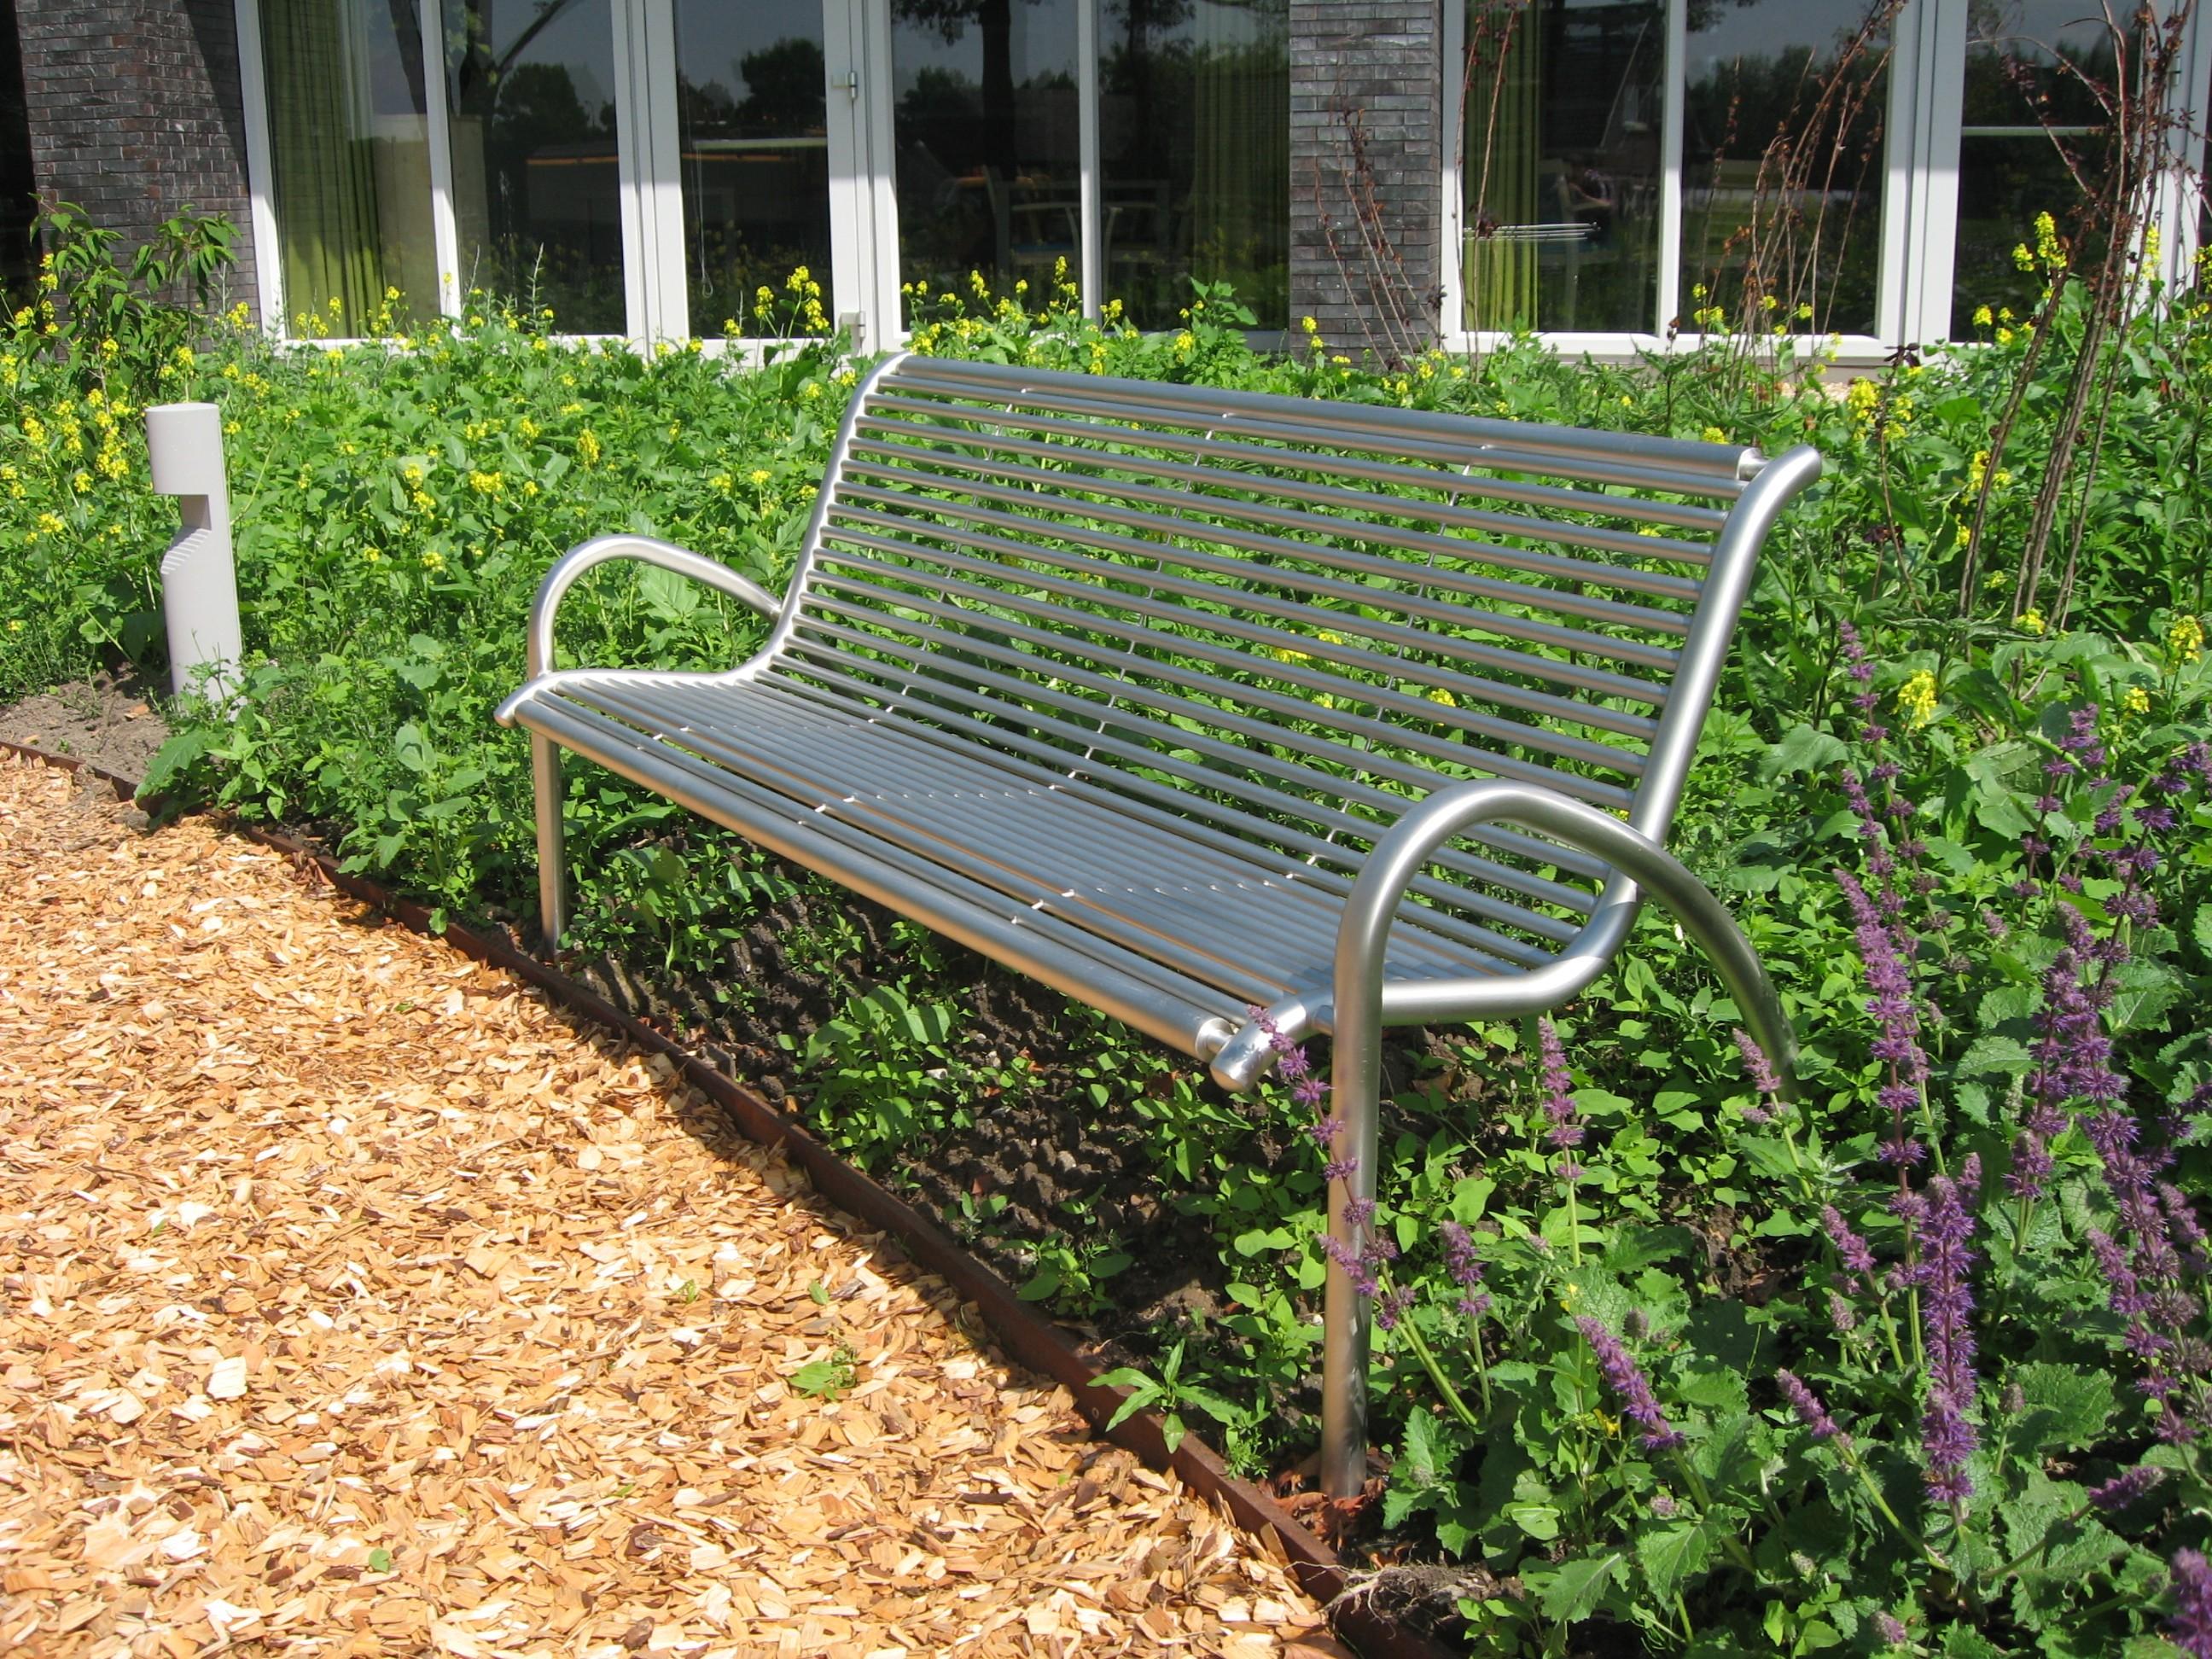 Hedendaags Gardinox, roestvast stalen tuin-, park- en straatinrichting TY-12